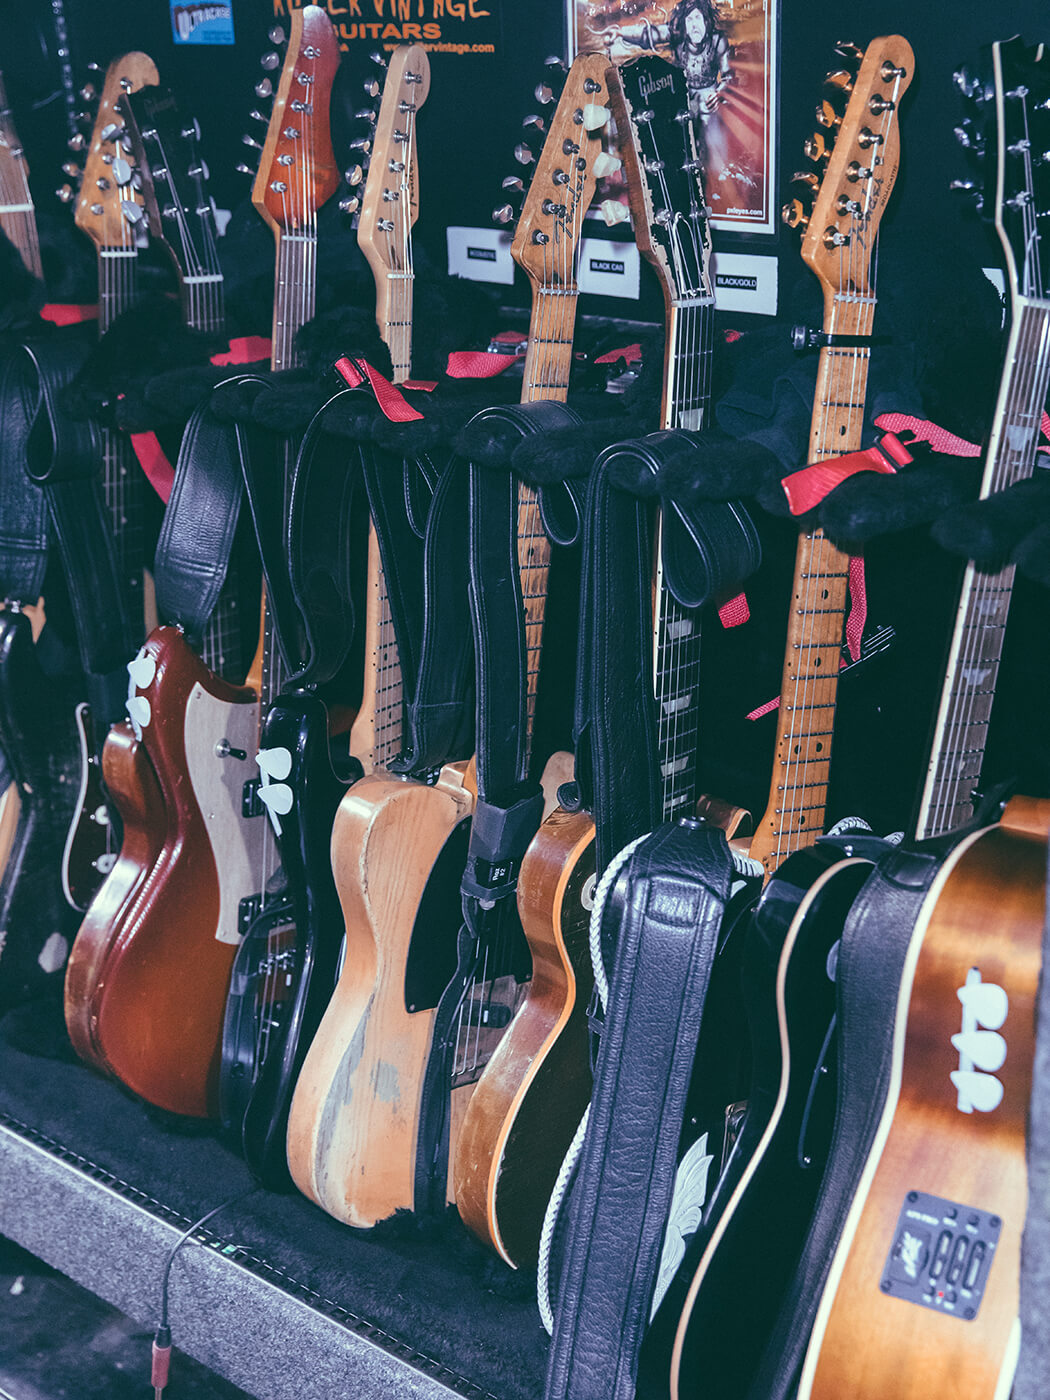 Keith Urban (Guitars)